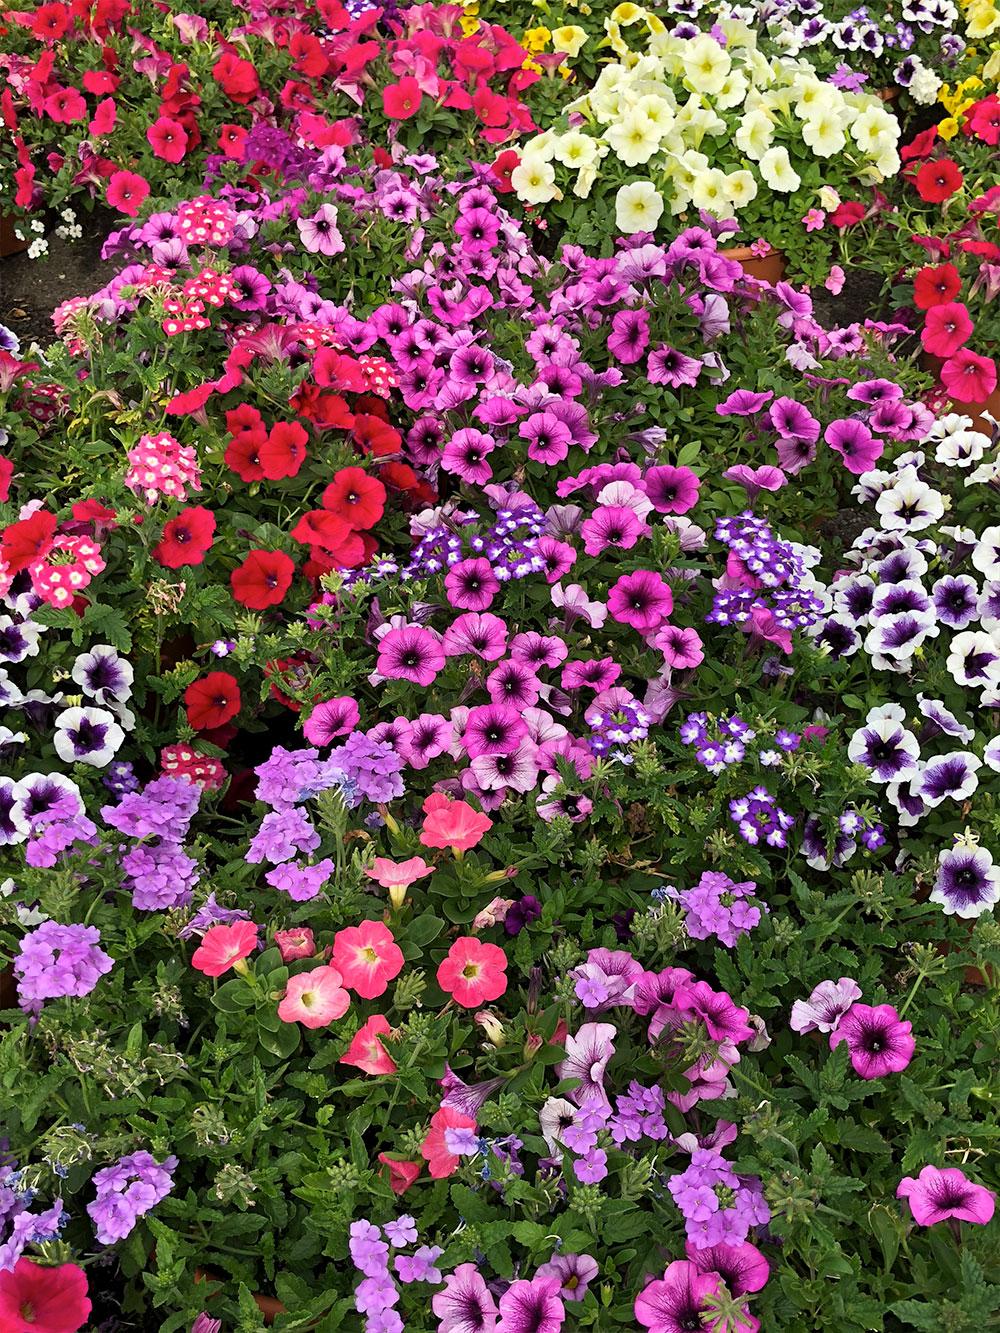 specials-flowers.jpg